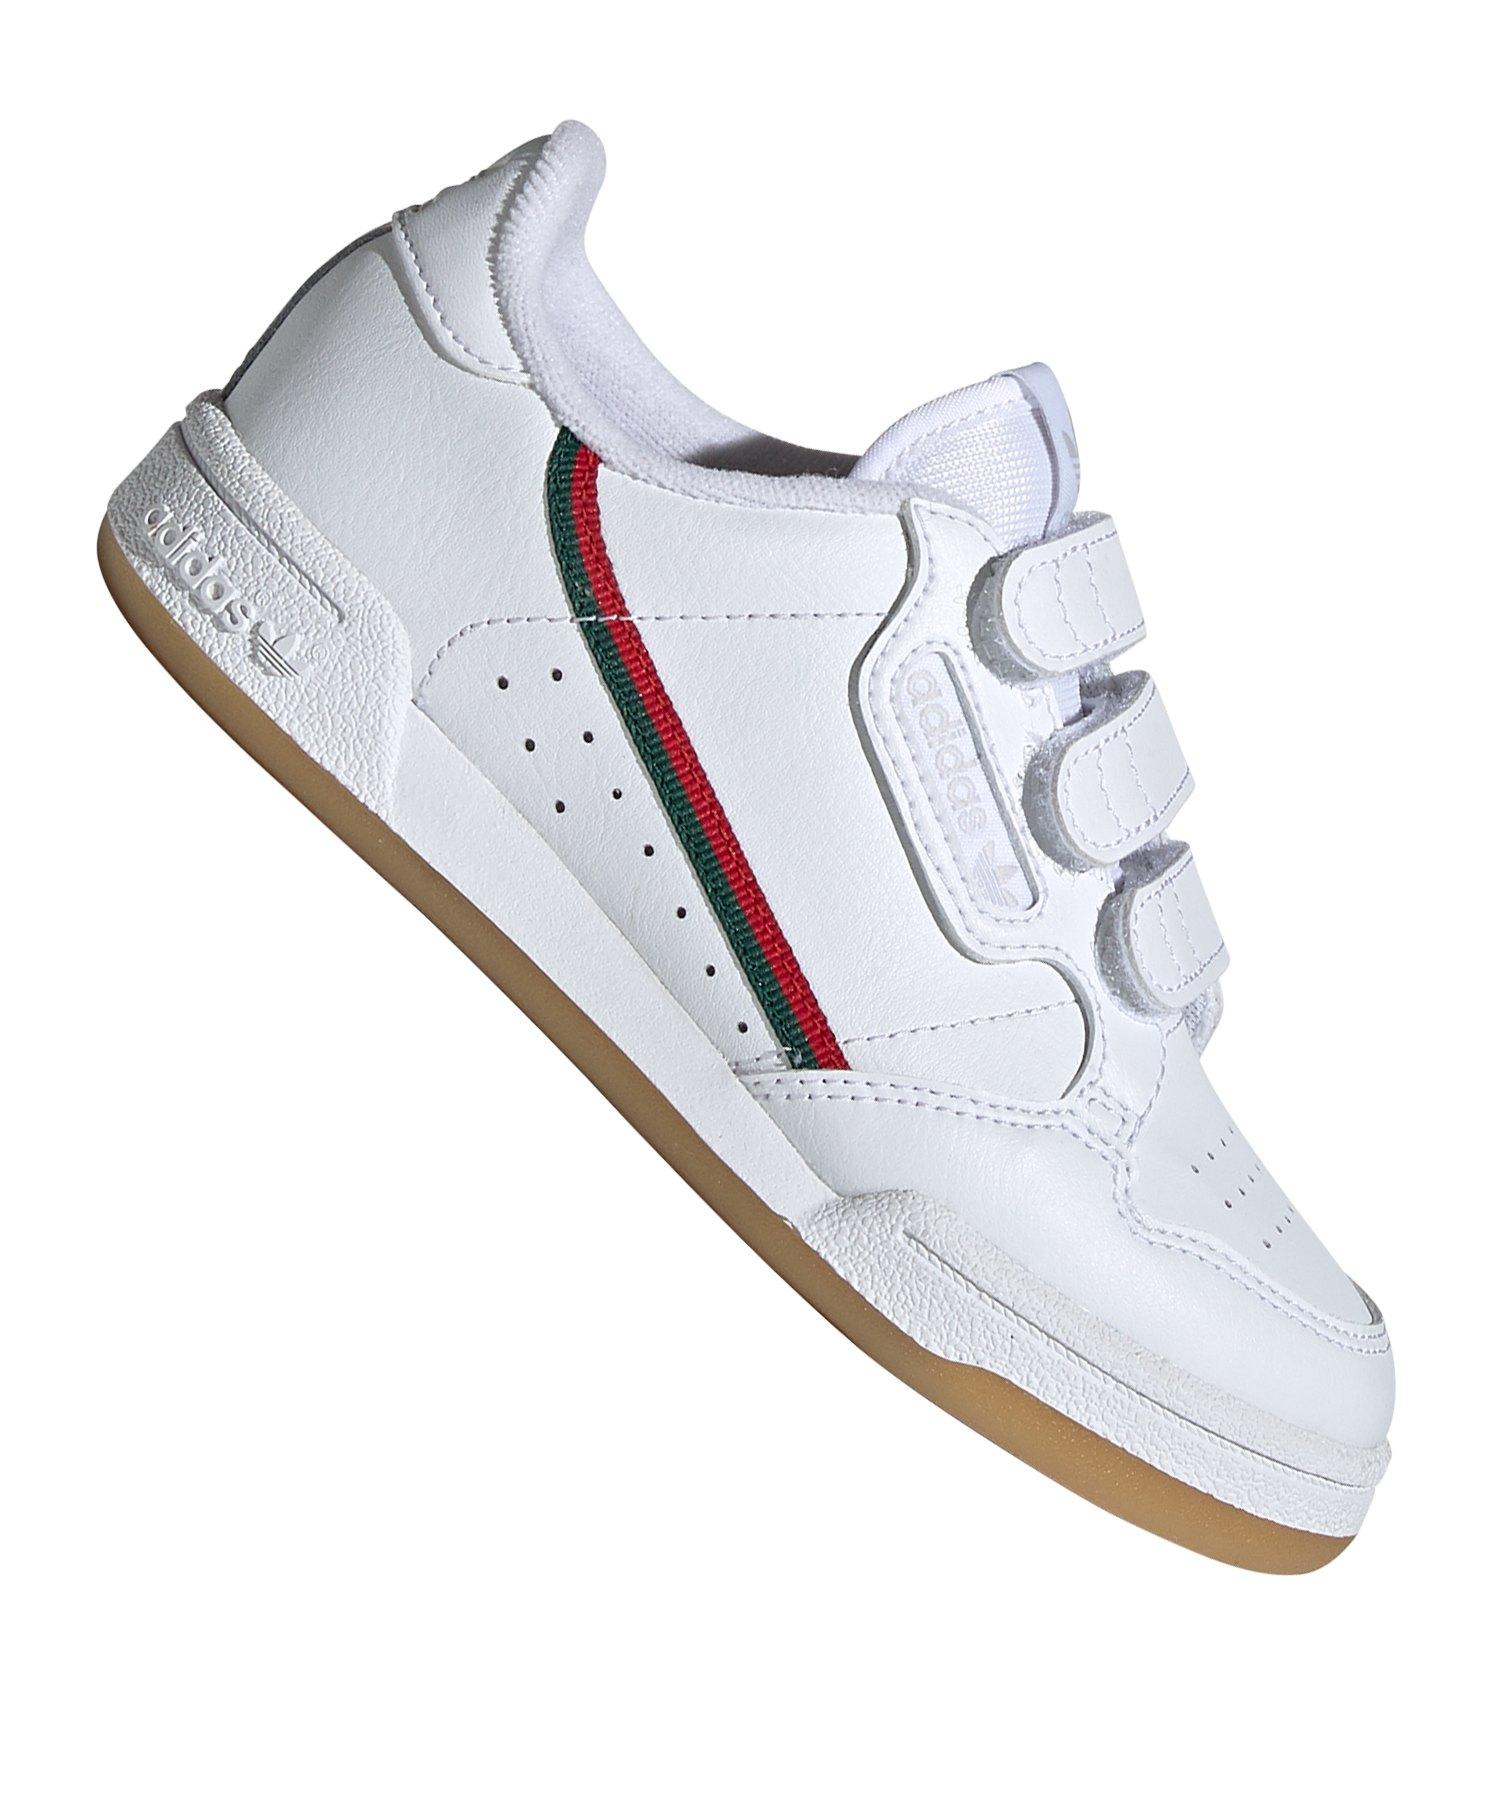 adidas Climacool 0217 white im SNIPES Onlineshop